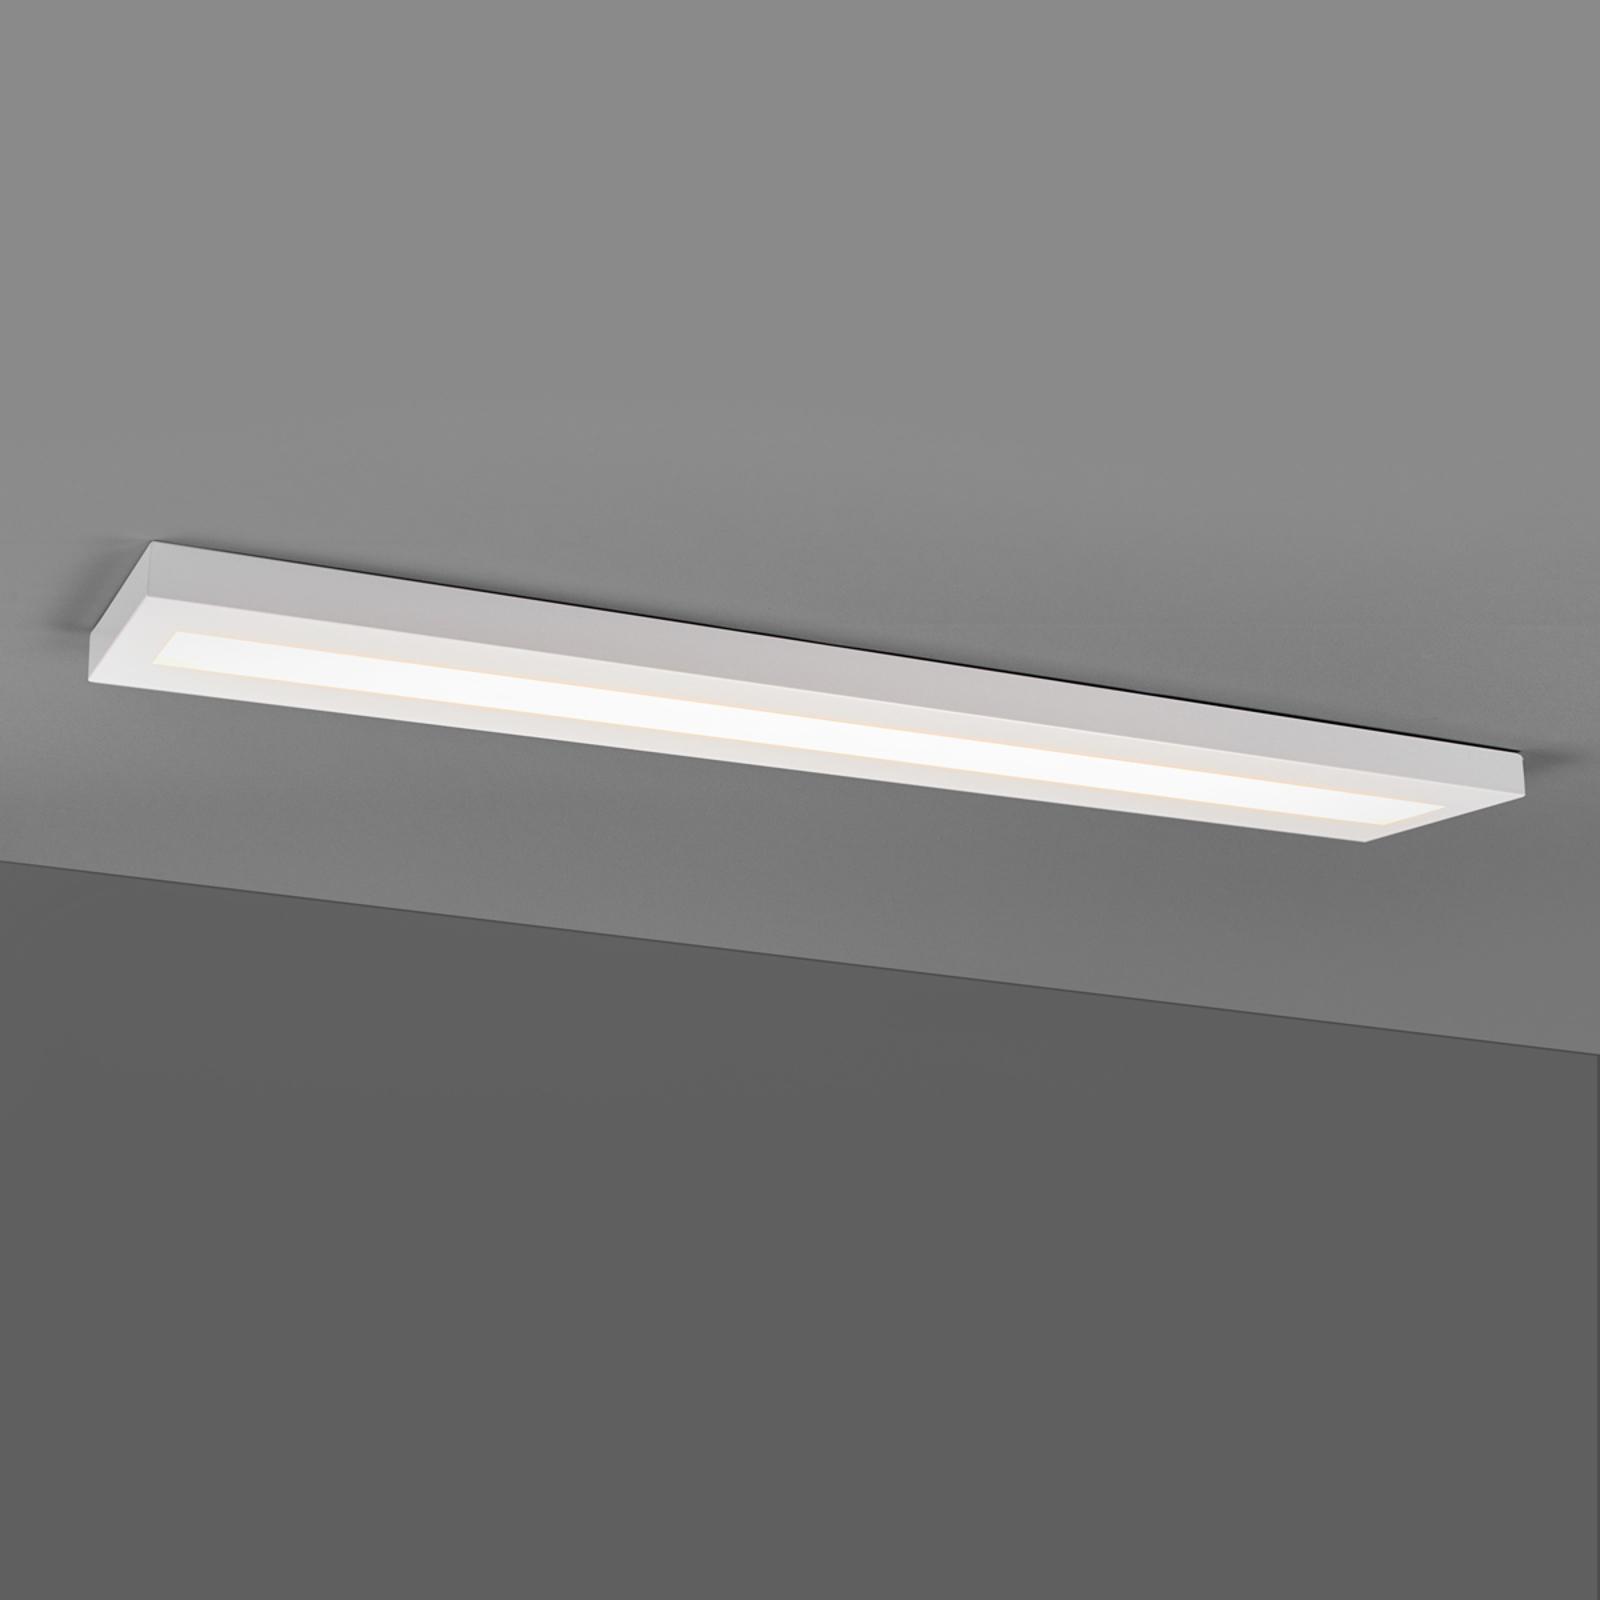 Plafoniera LED lineare 33 W bianca, BAP